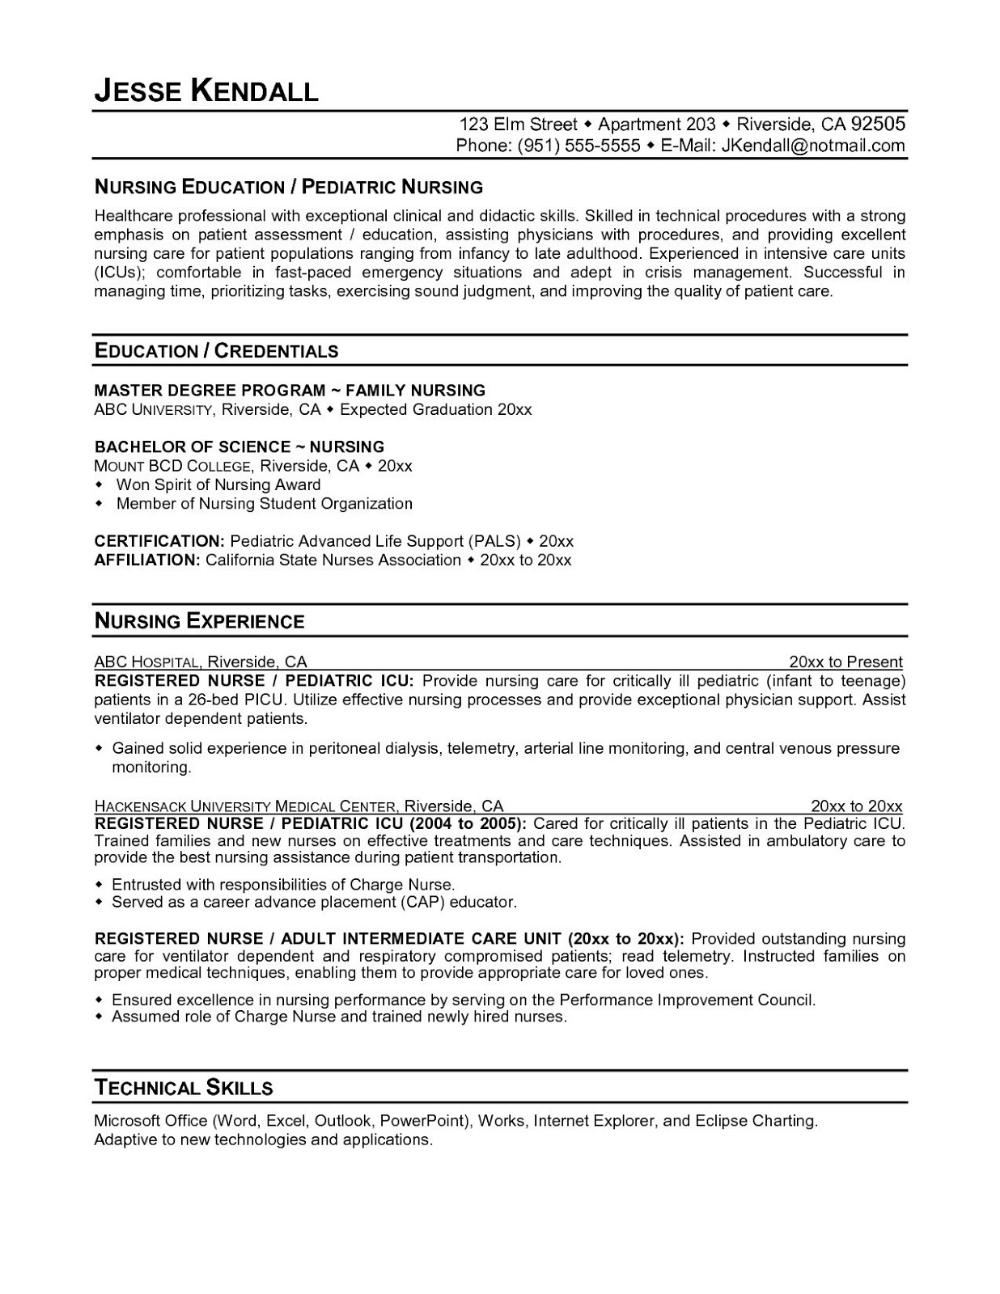 Nursing Resume Examples 2019 New Grad Pdf 2020 Nursing Resume